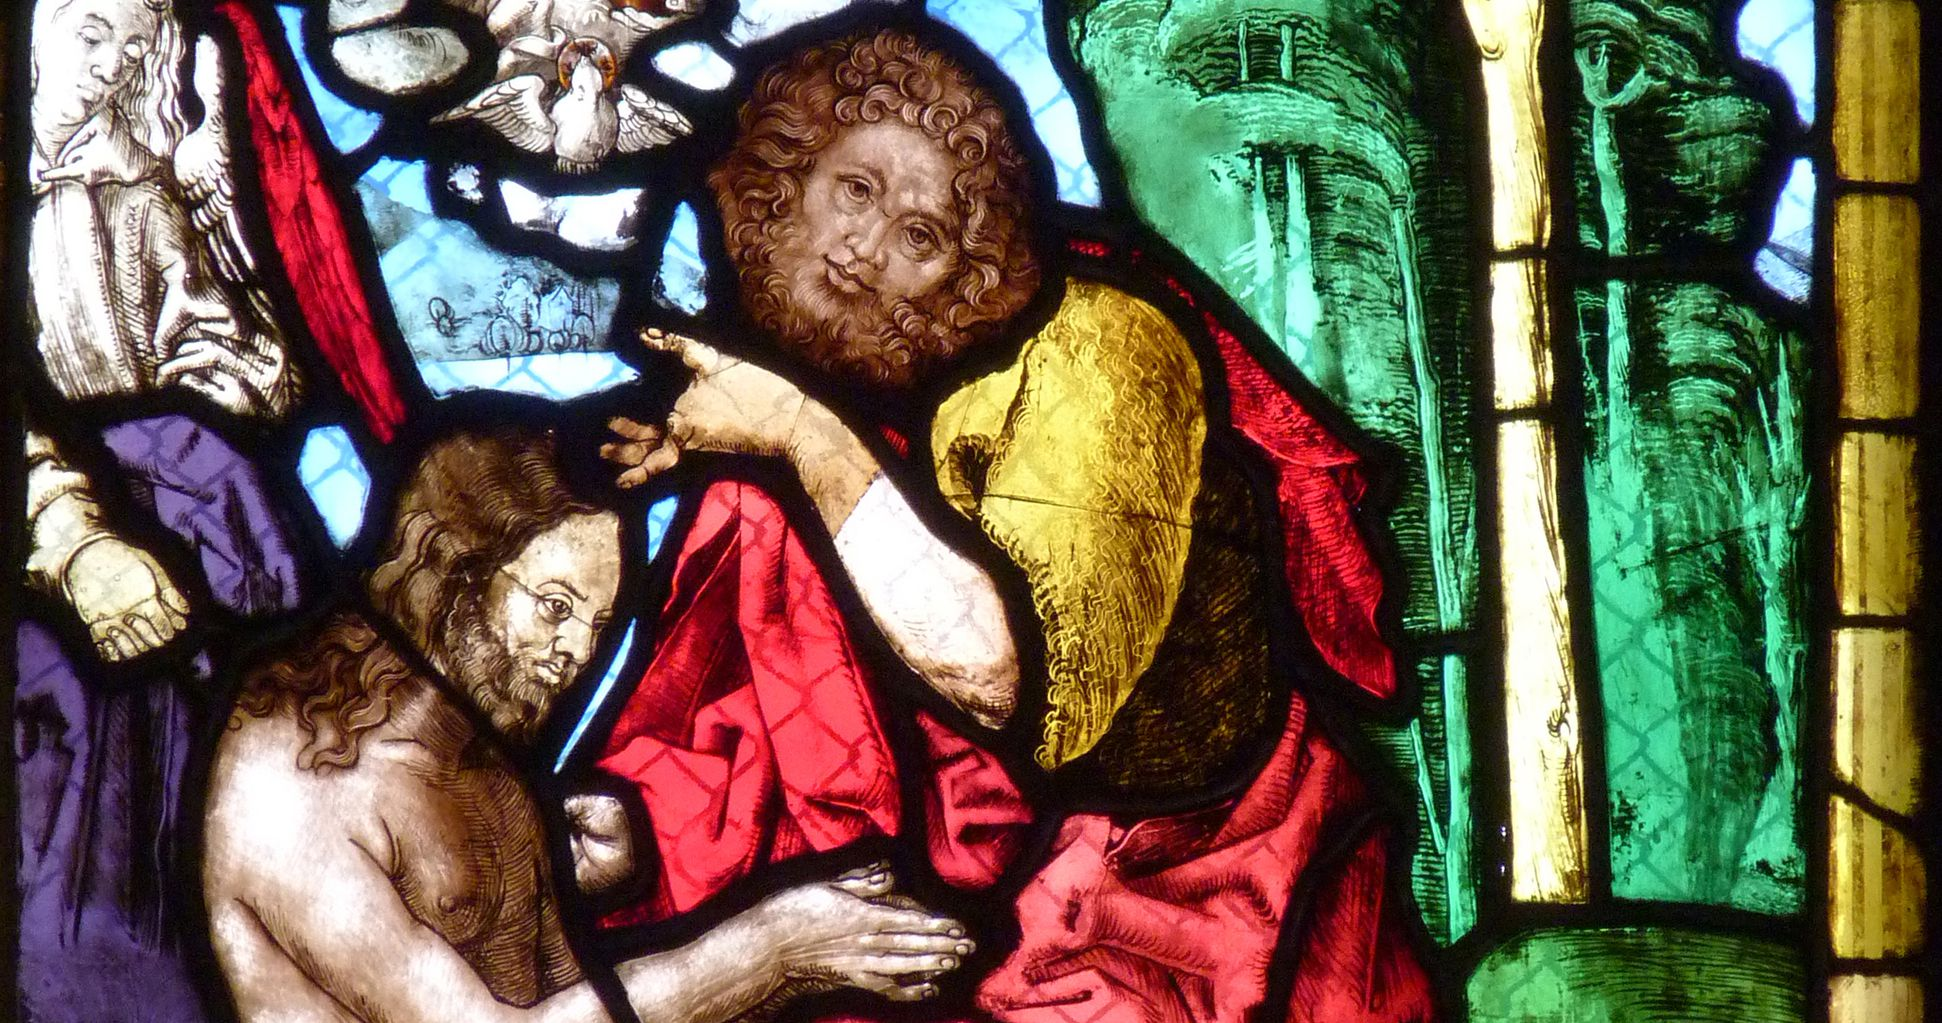 St. Bartholomäus, Chorfenster n II Vierte Zeile, Fenster a, Taufe Christi, Detail